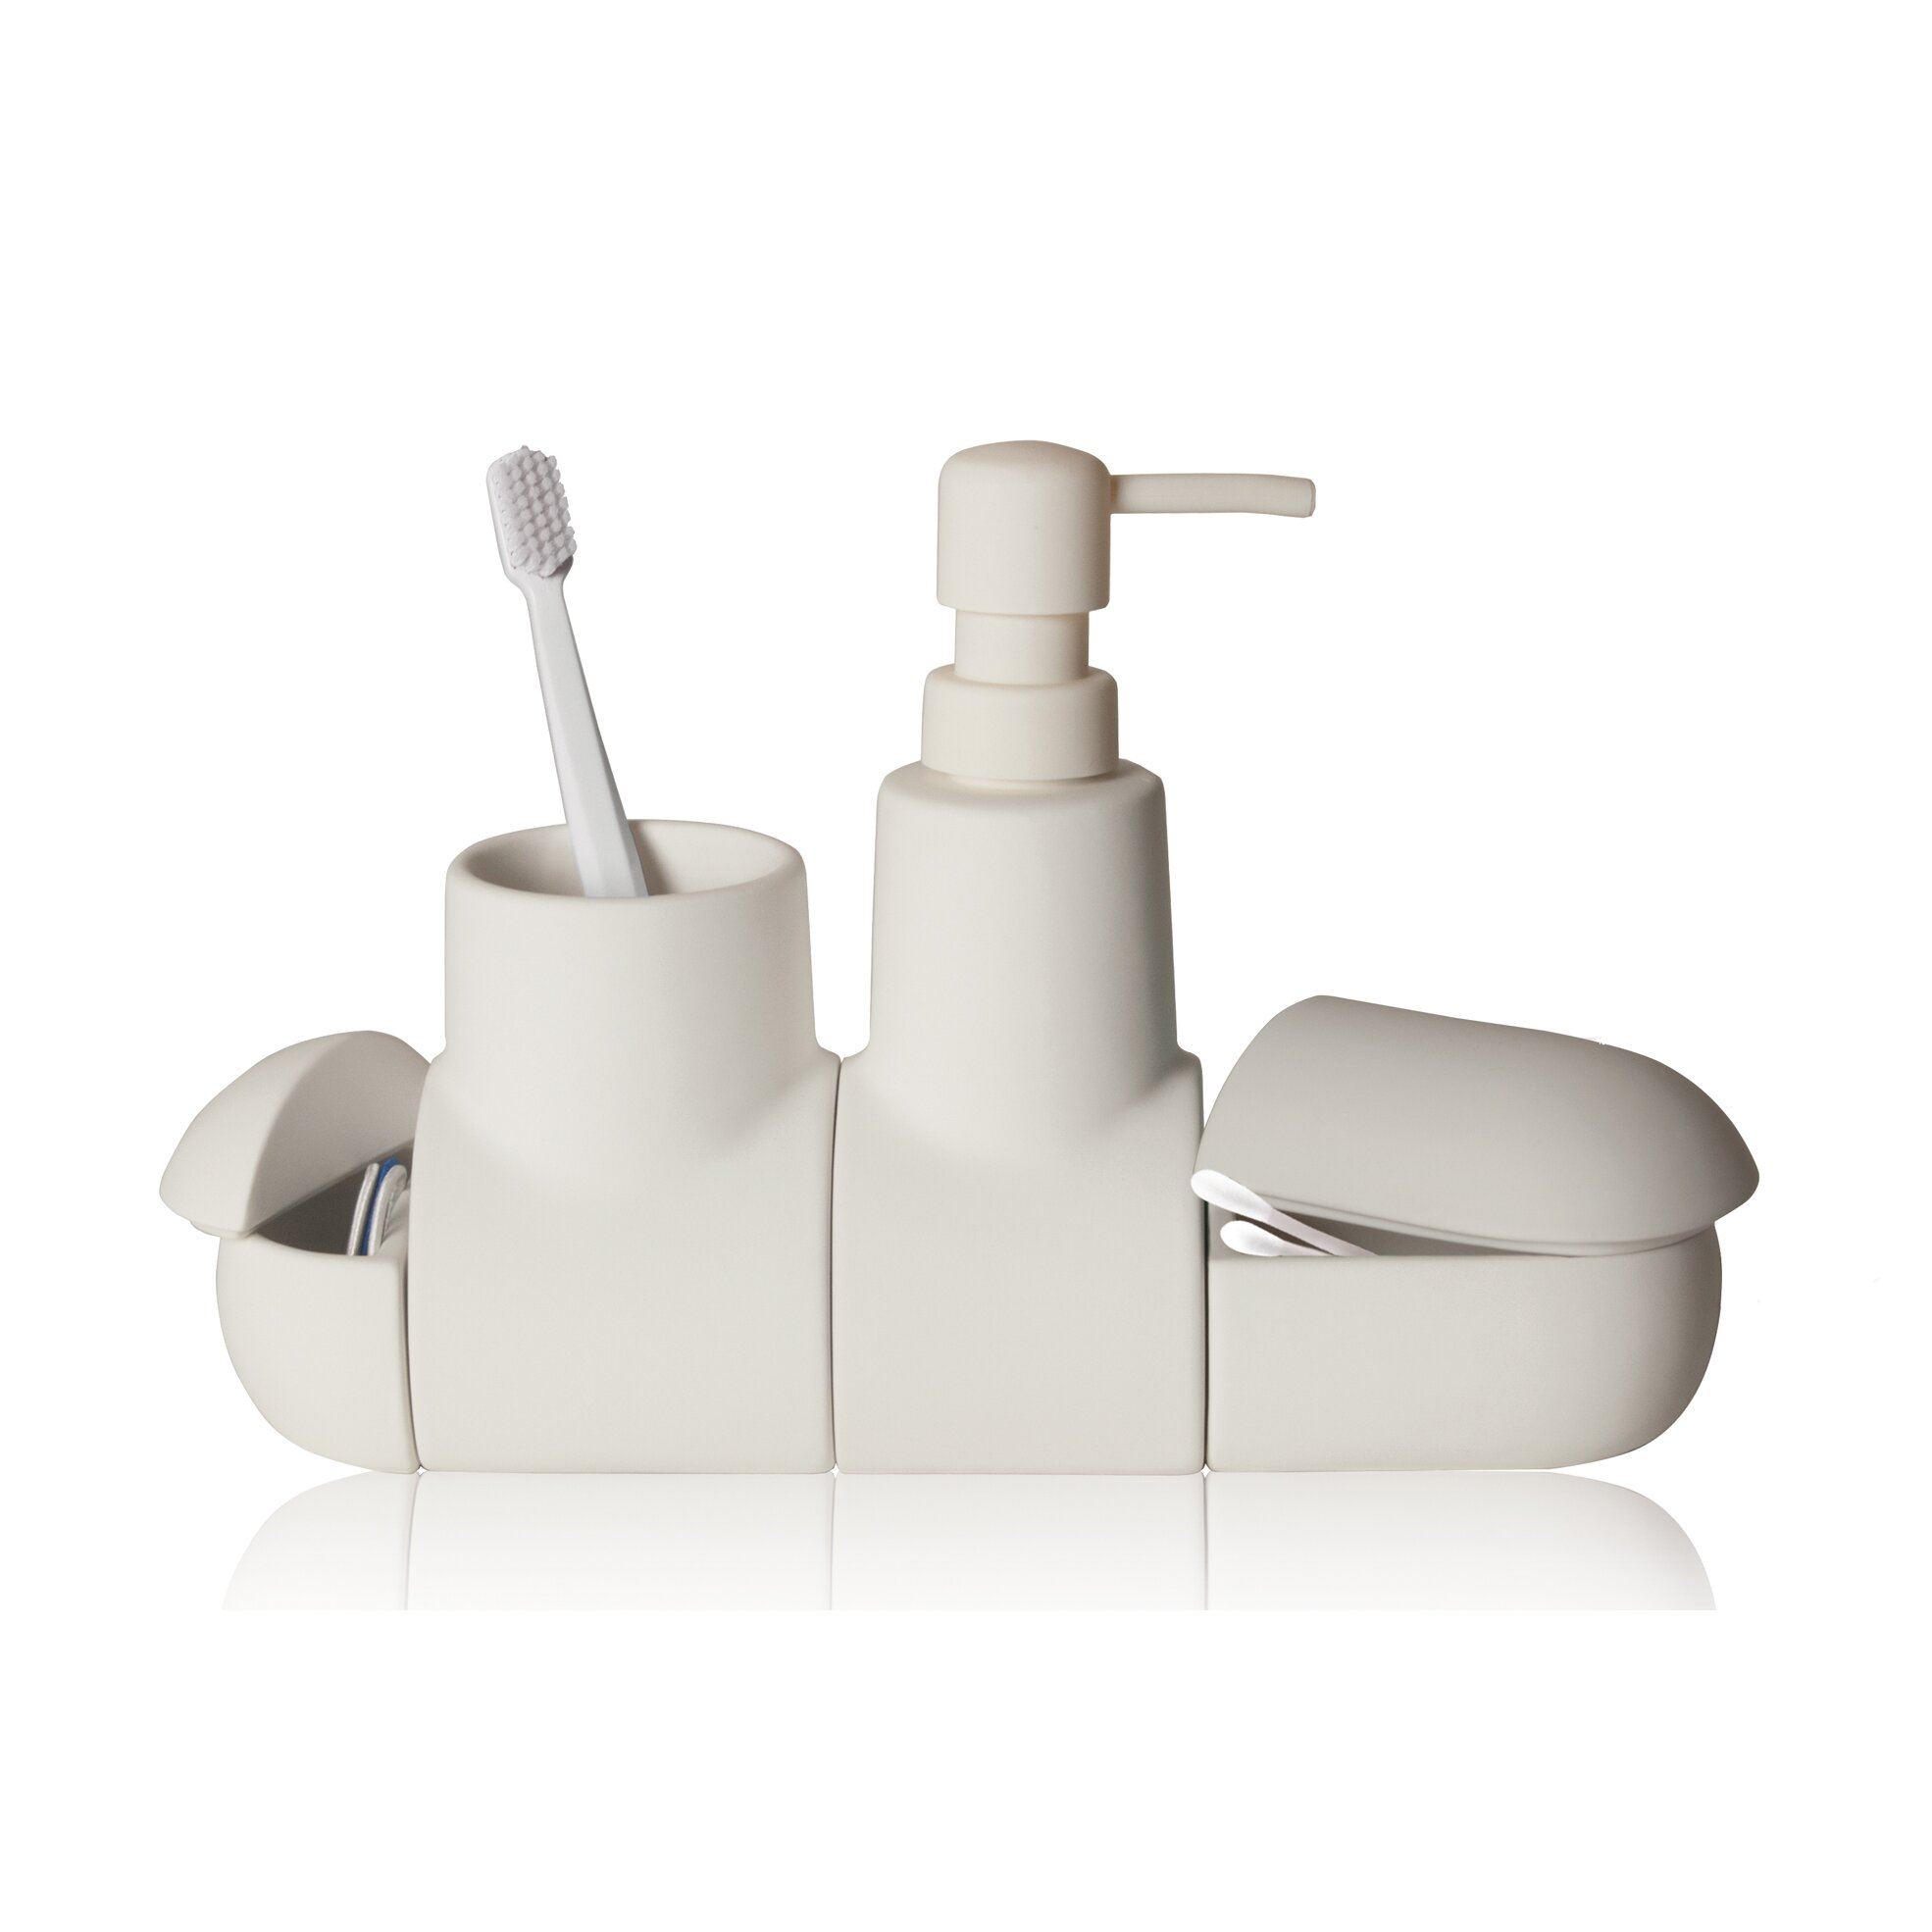 Seletti submarino porcelain bathroom accessory set for Design accessoires